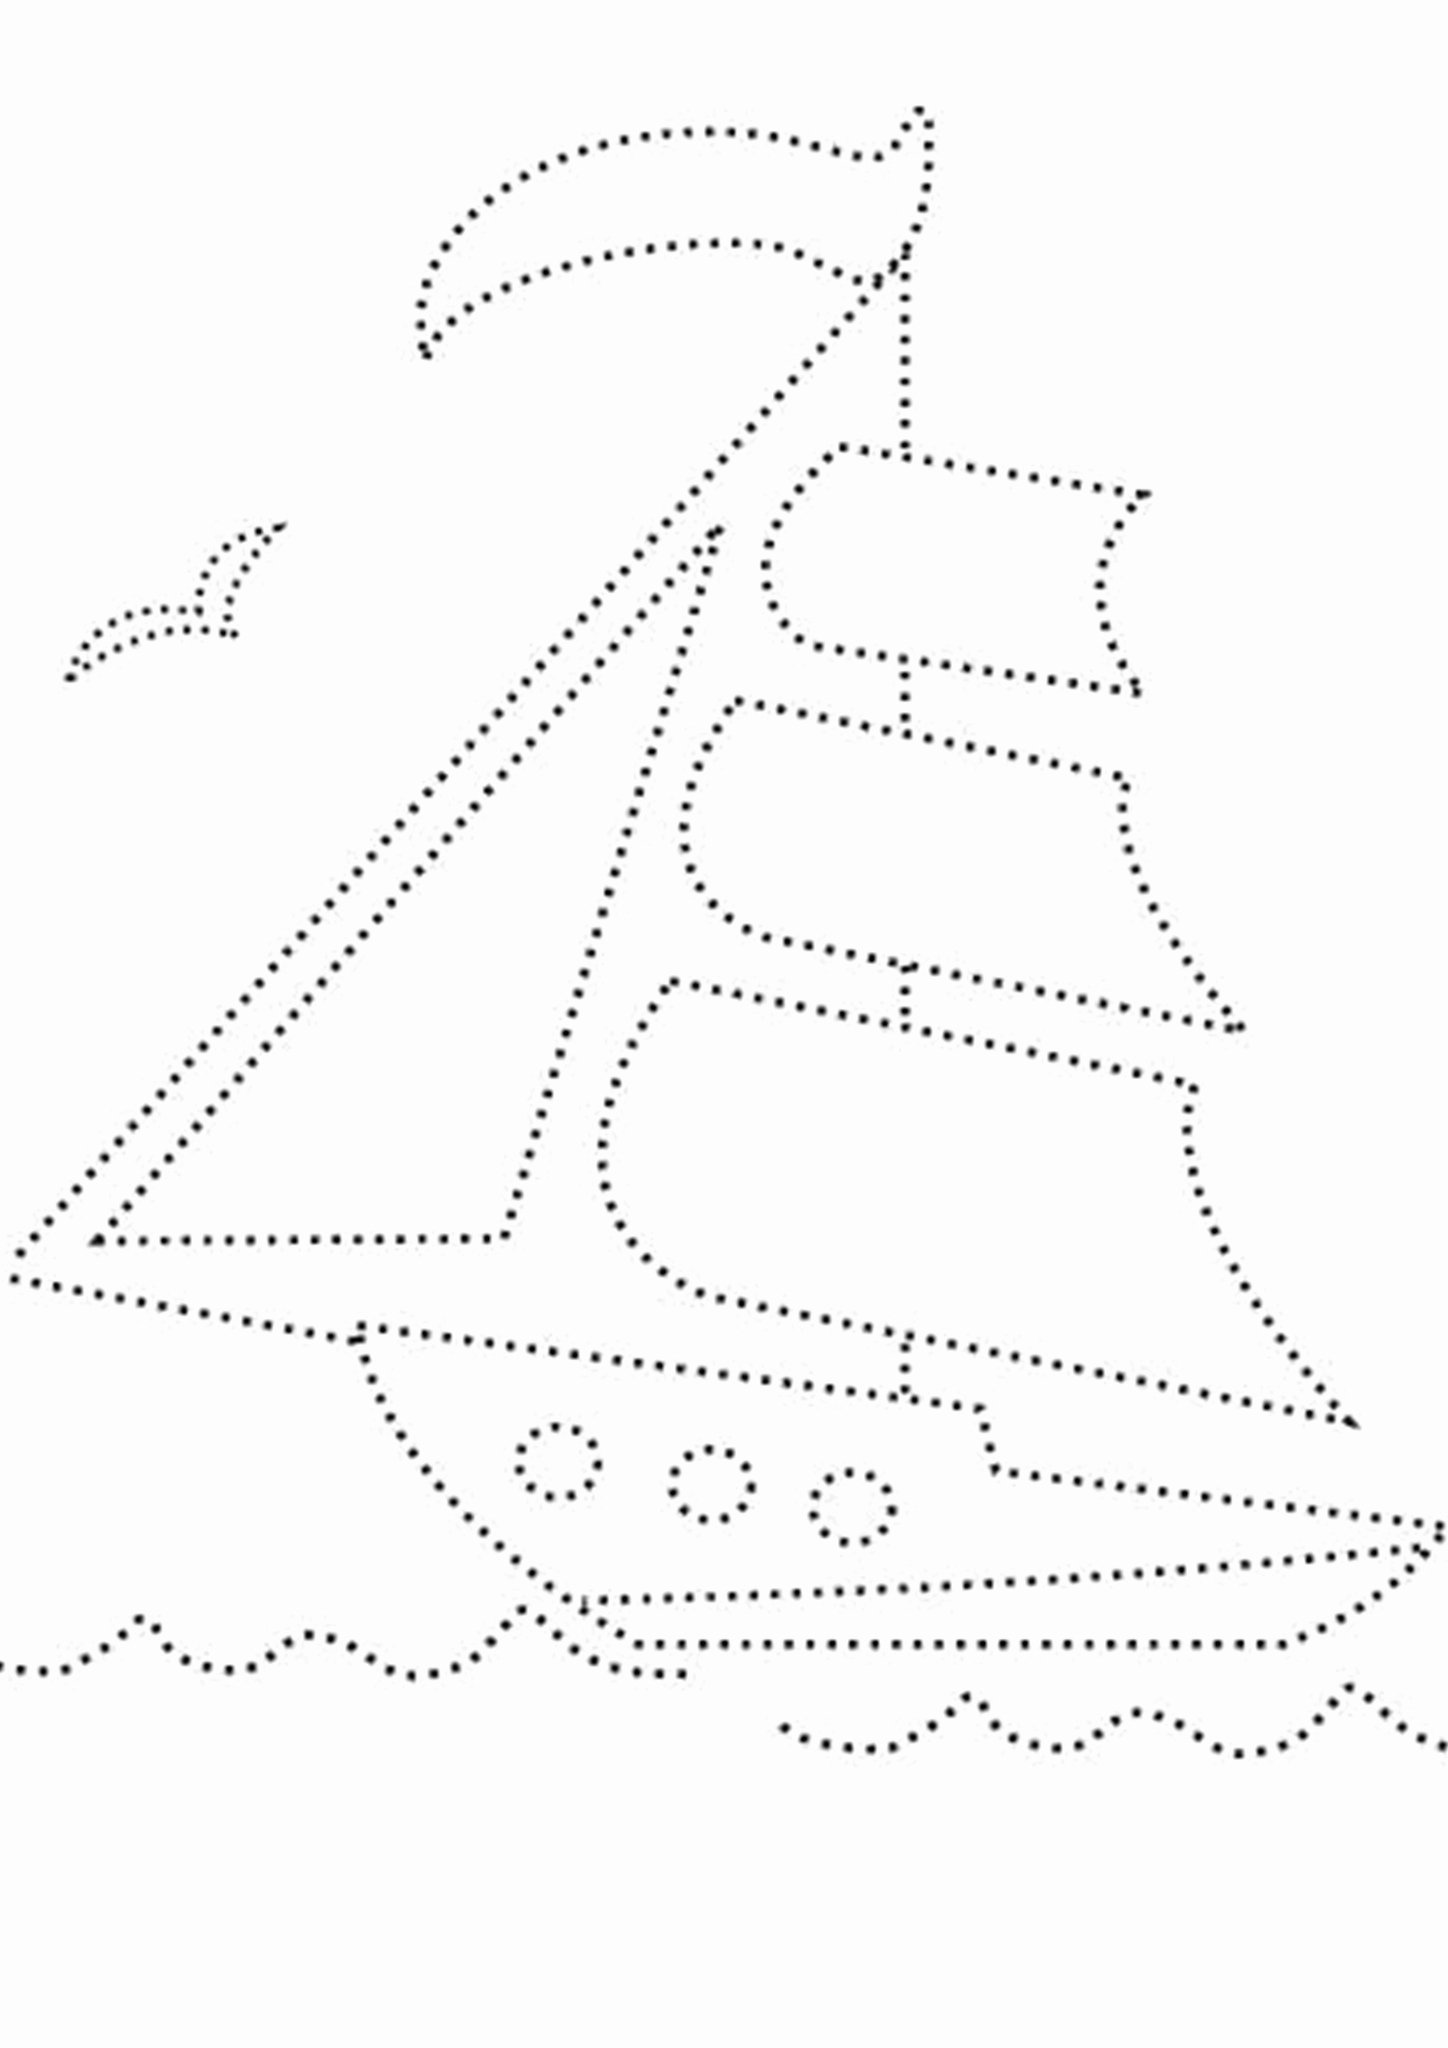 Boat Worksheets for Preschoolers Lovely Worksheets Boat Shapes Worksheet Printable Worksheets and